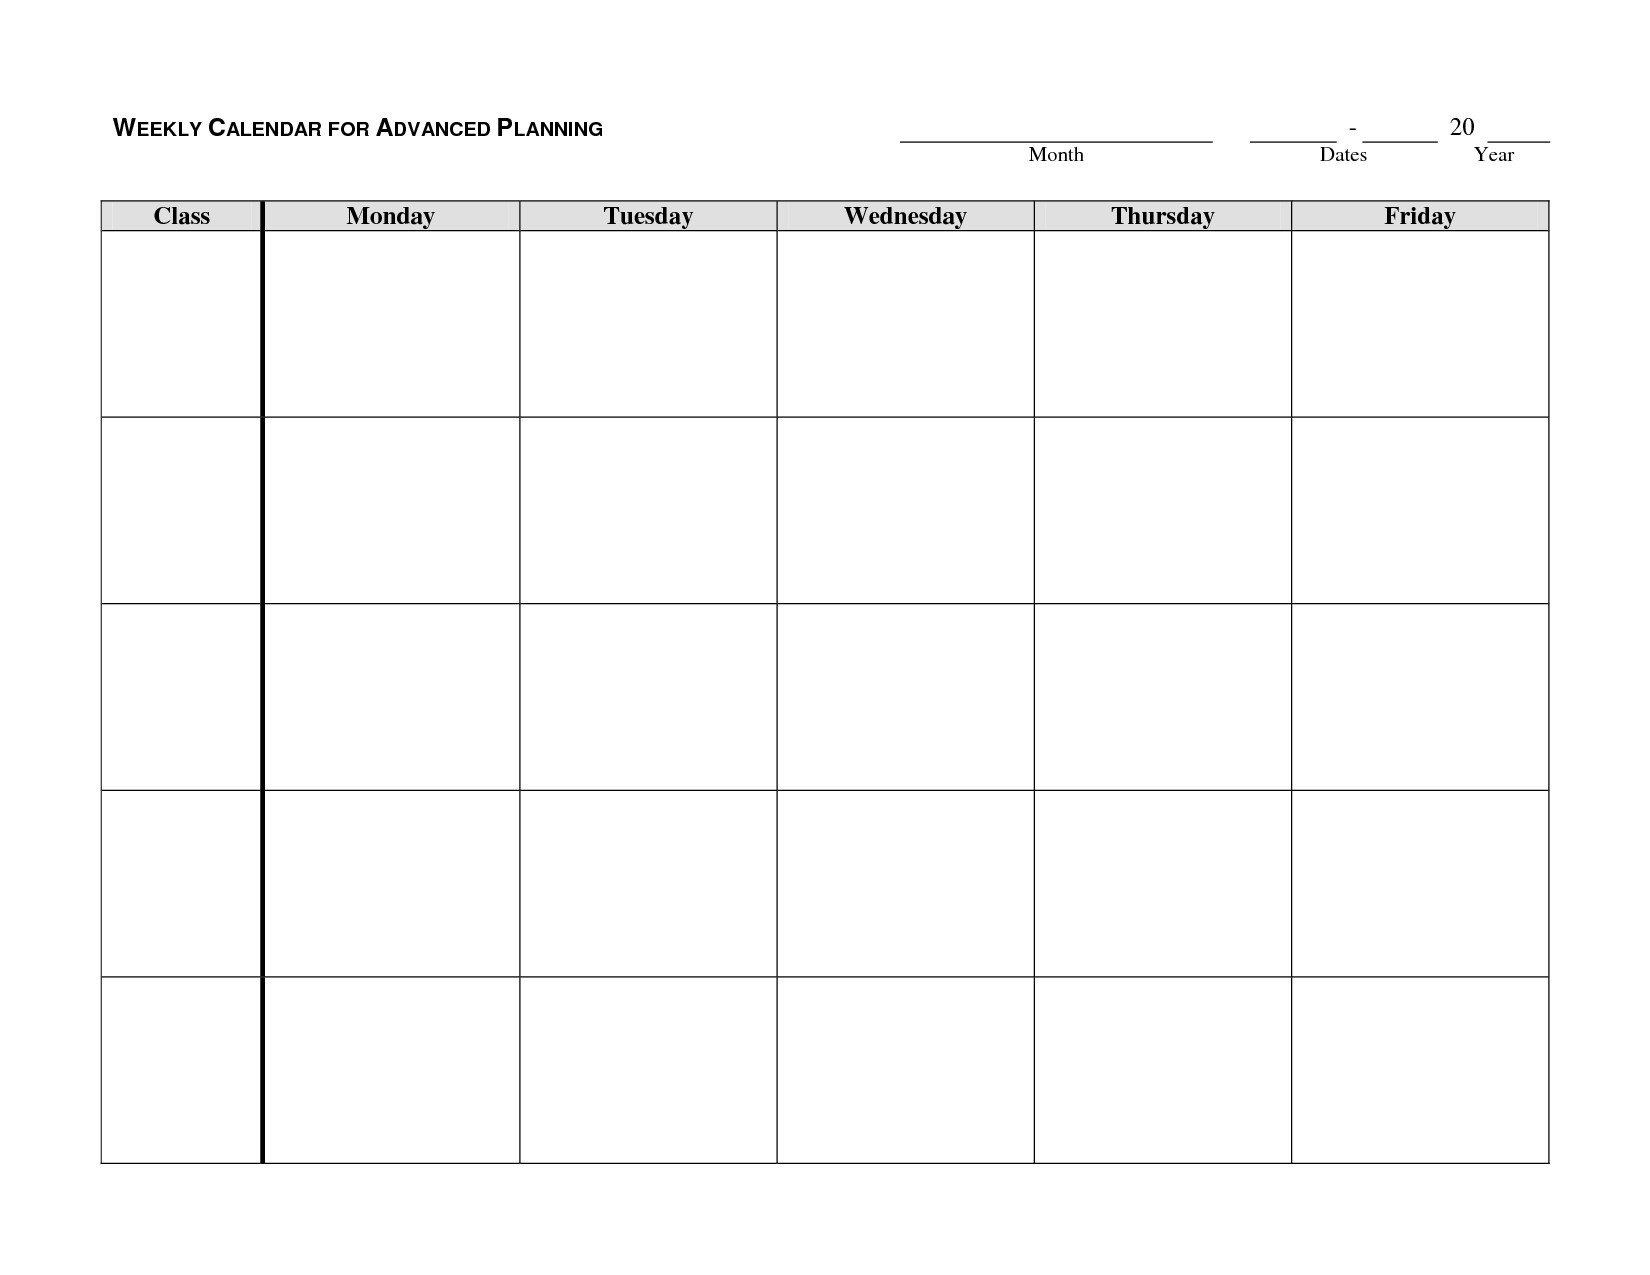 Monday Friday Blank Weekly Schedule   Calendar Template Monday Thru Friday Calender